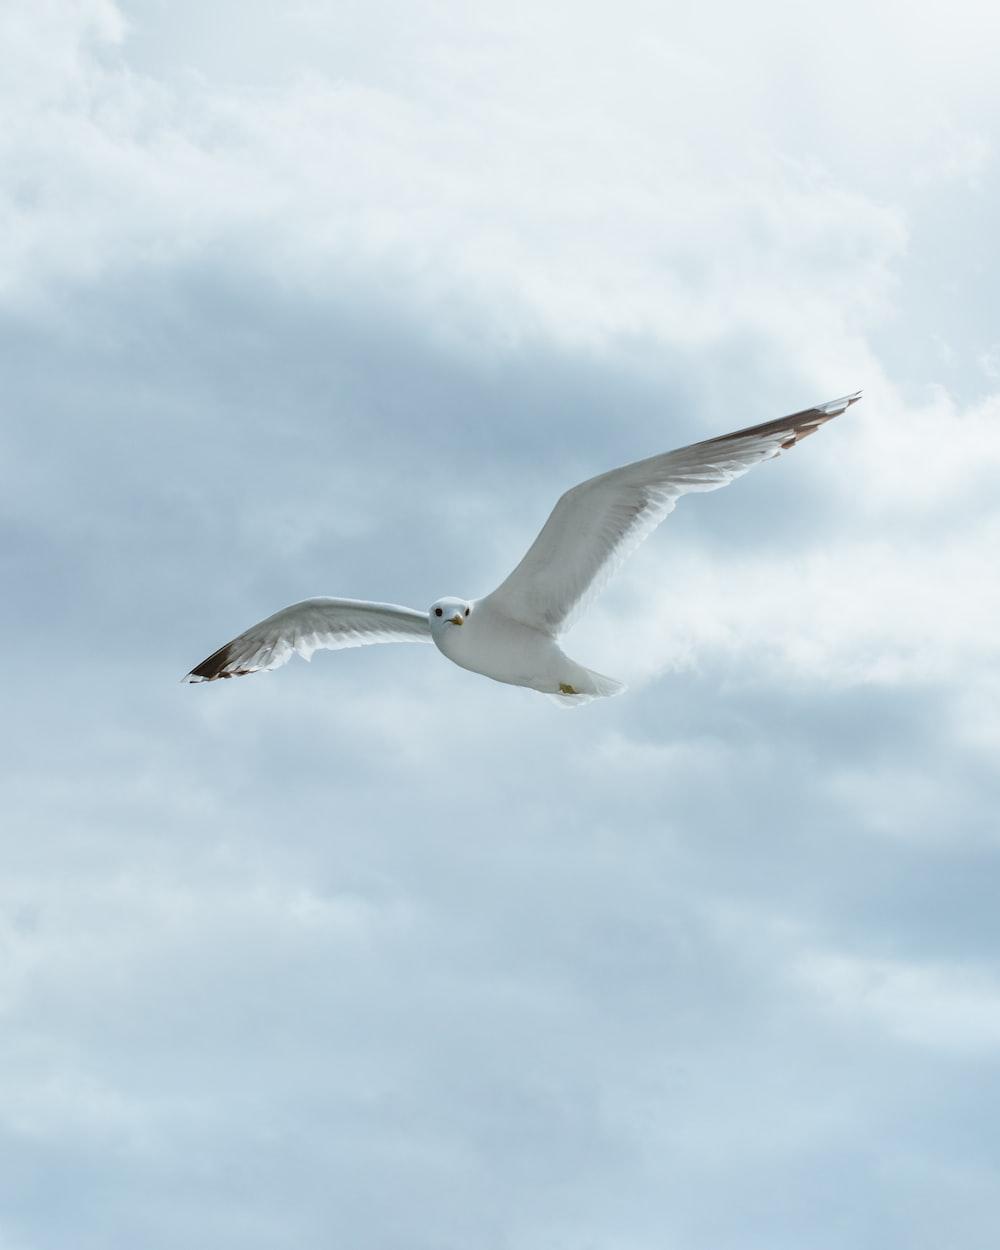 white bird in sky during daytime